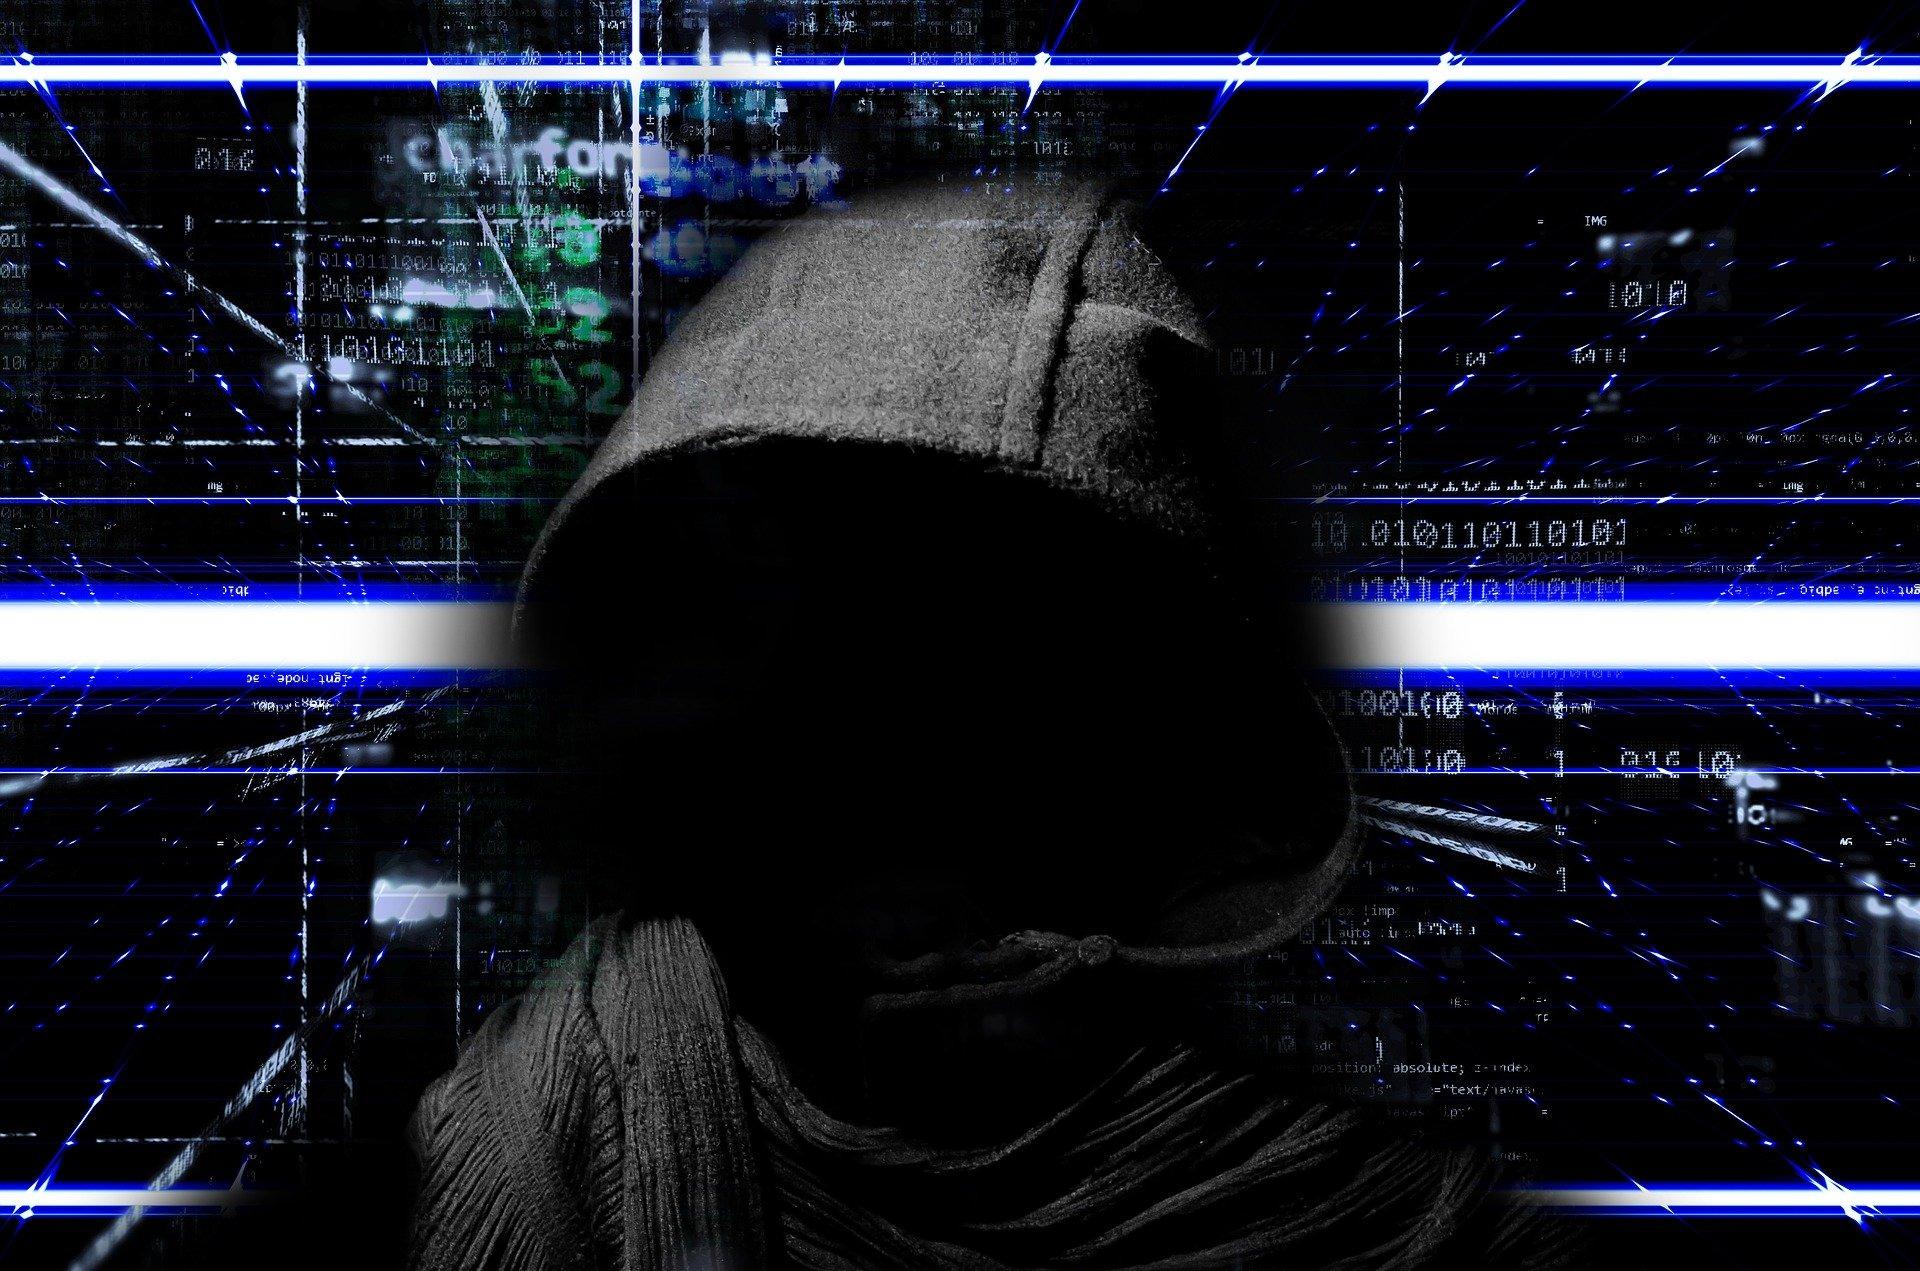 cyberattaque-hacking-cybersecurite-risque-crise-cyber